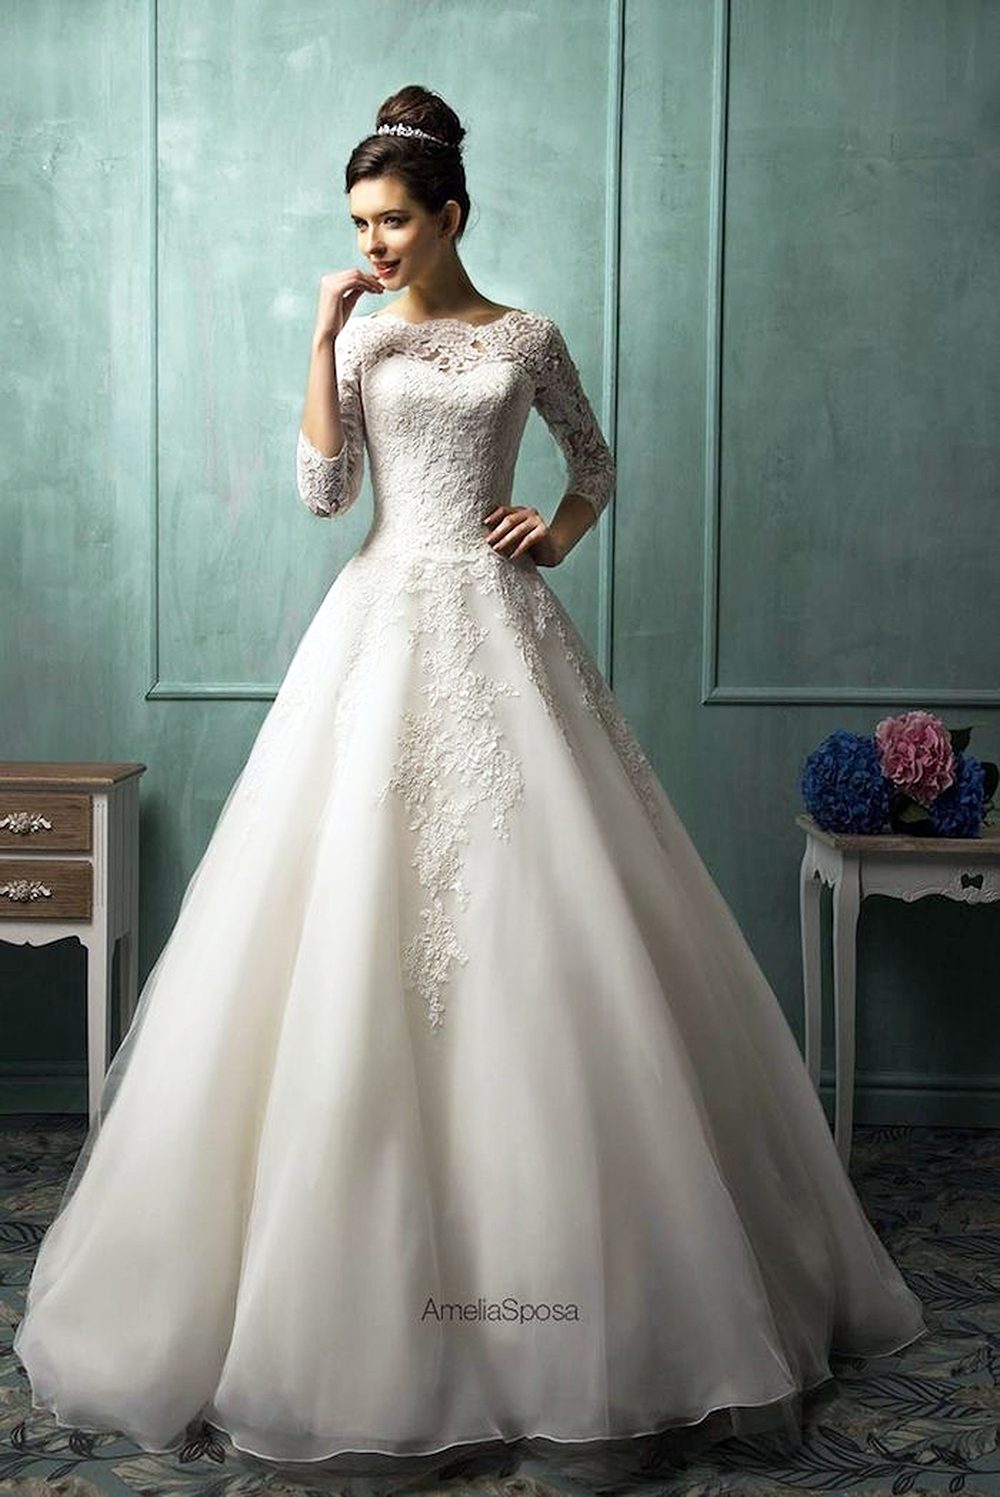 Bride's Dresses